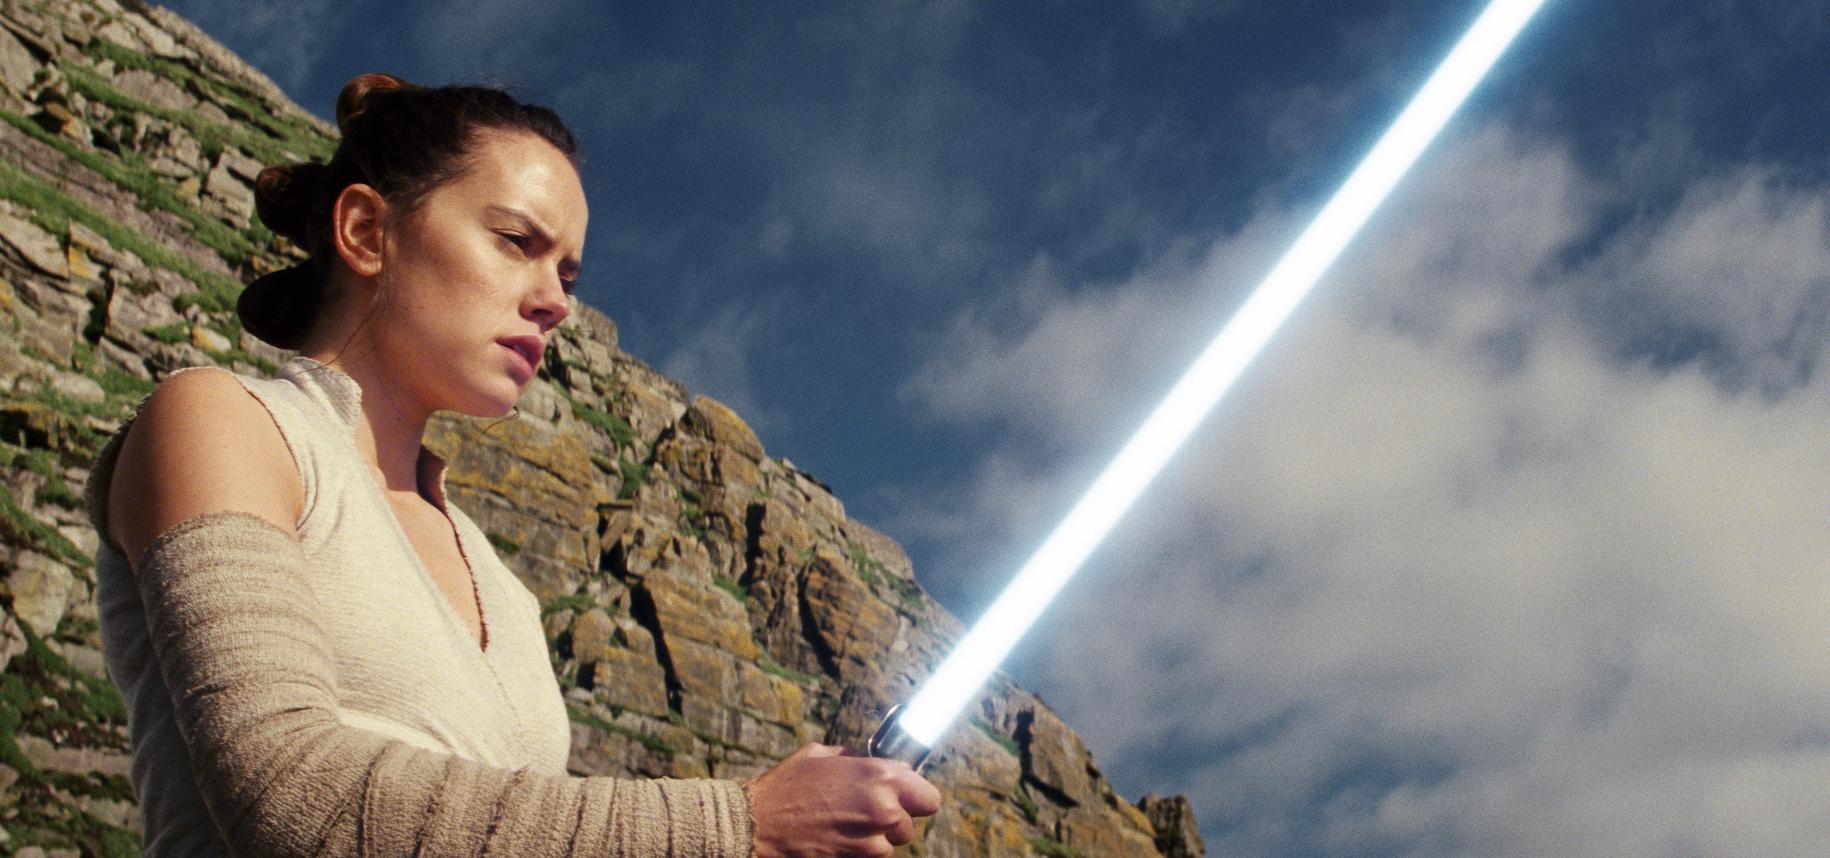 Star_Wars_Celebration-Episode_IX_Panel_65372-159532.jpg95731915